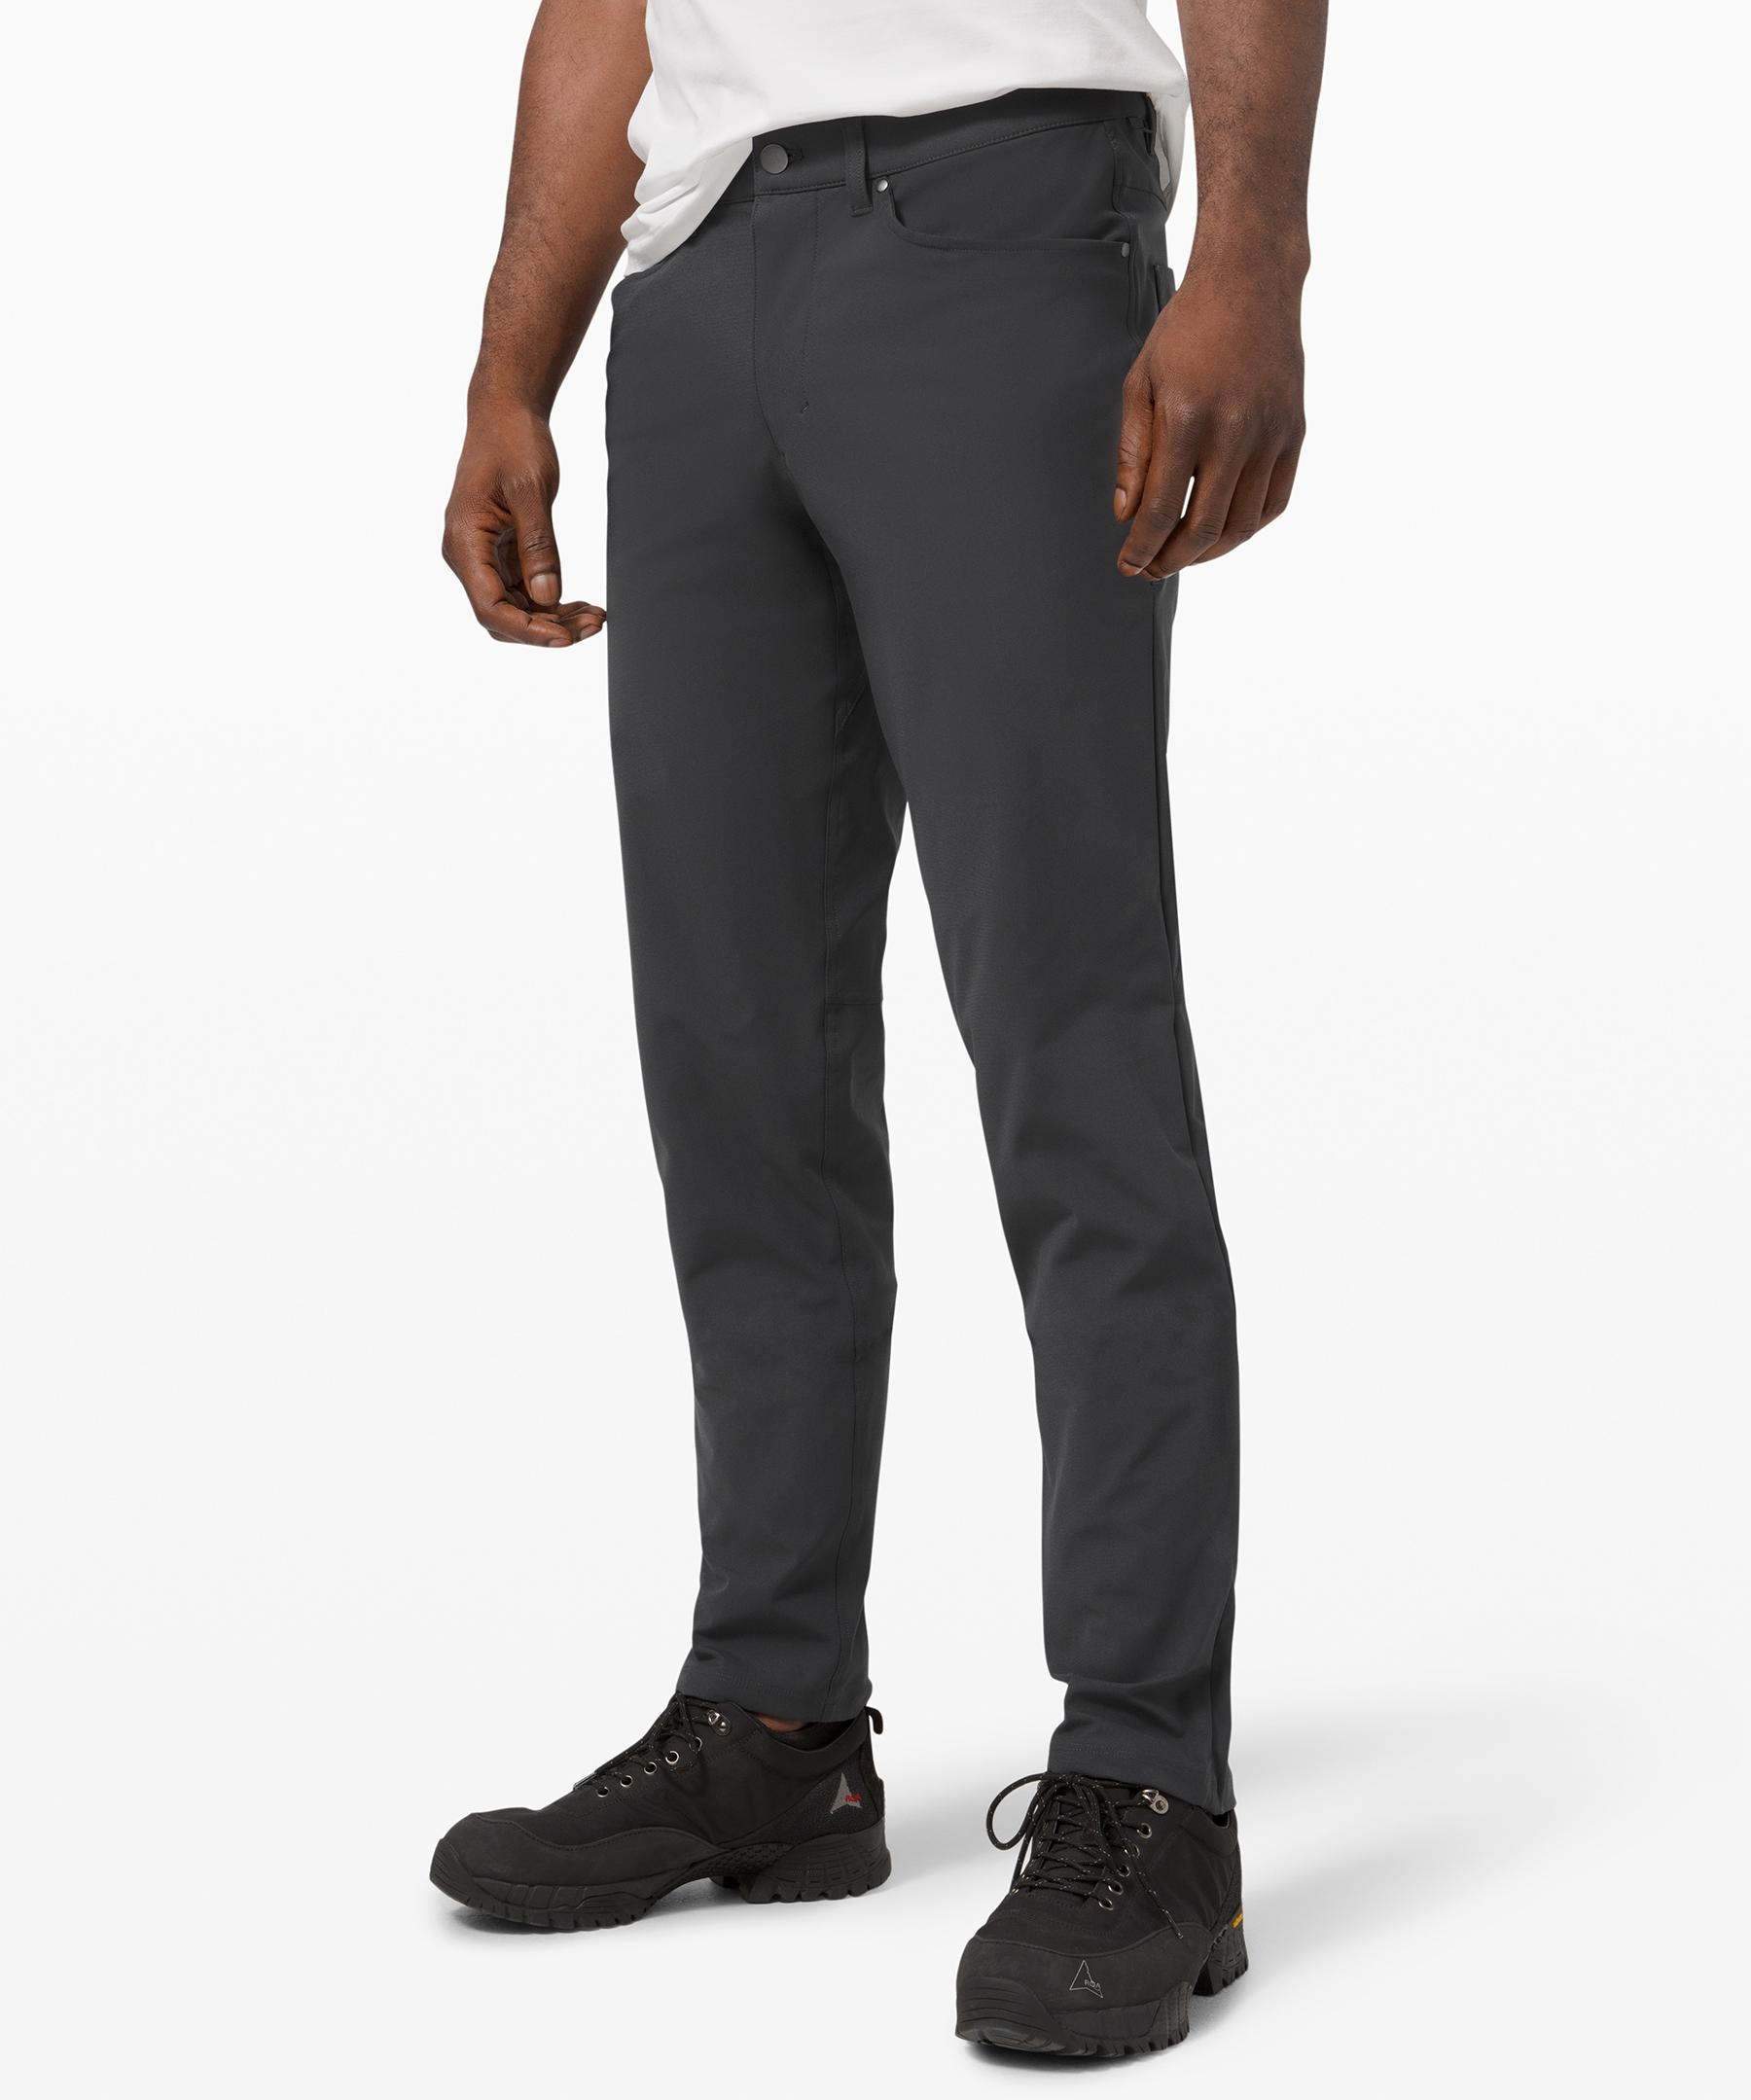 The ABC Classic pants